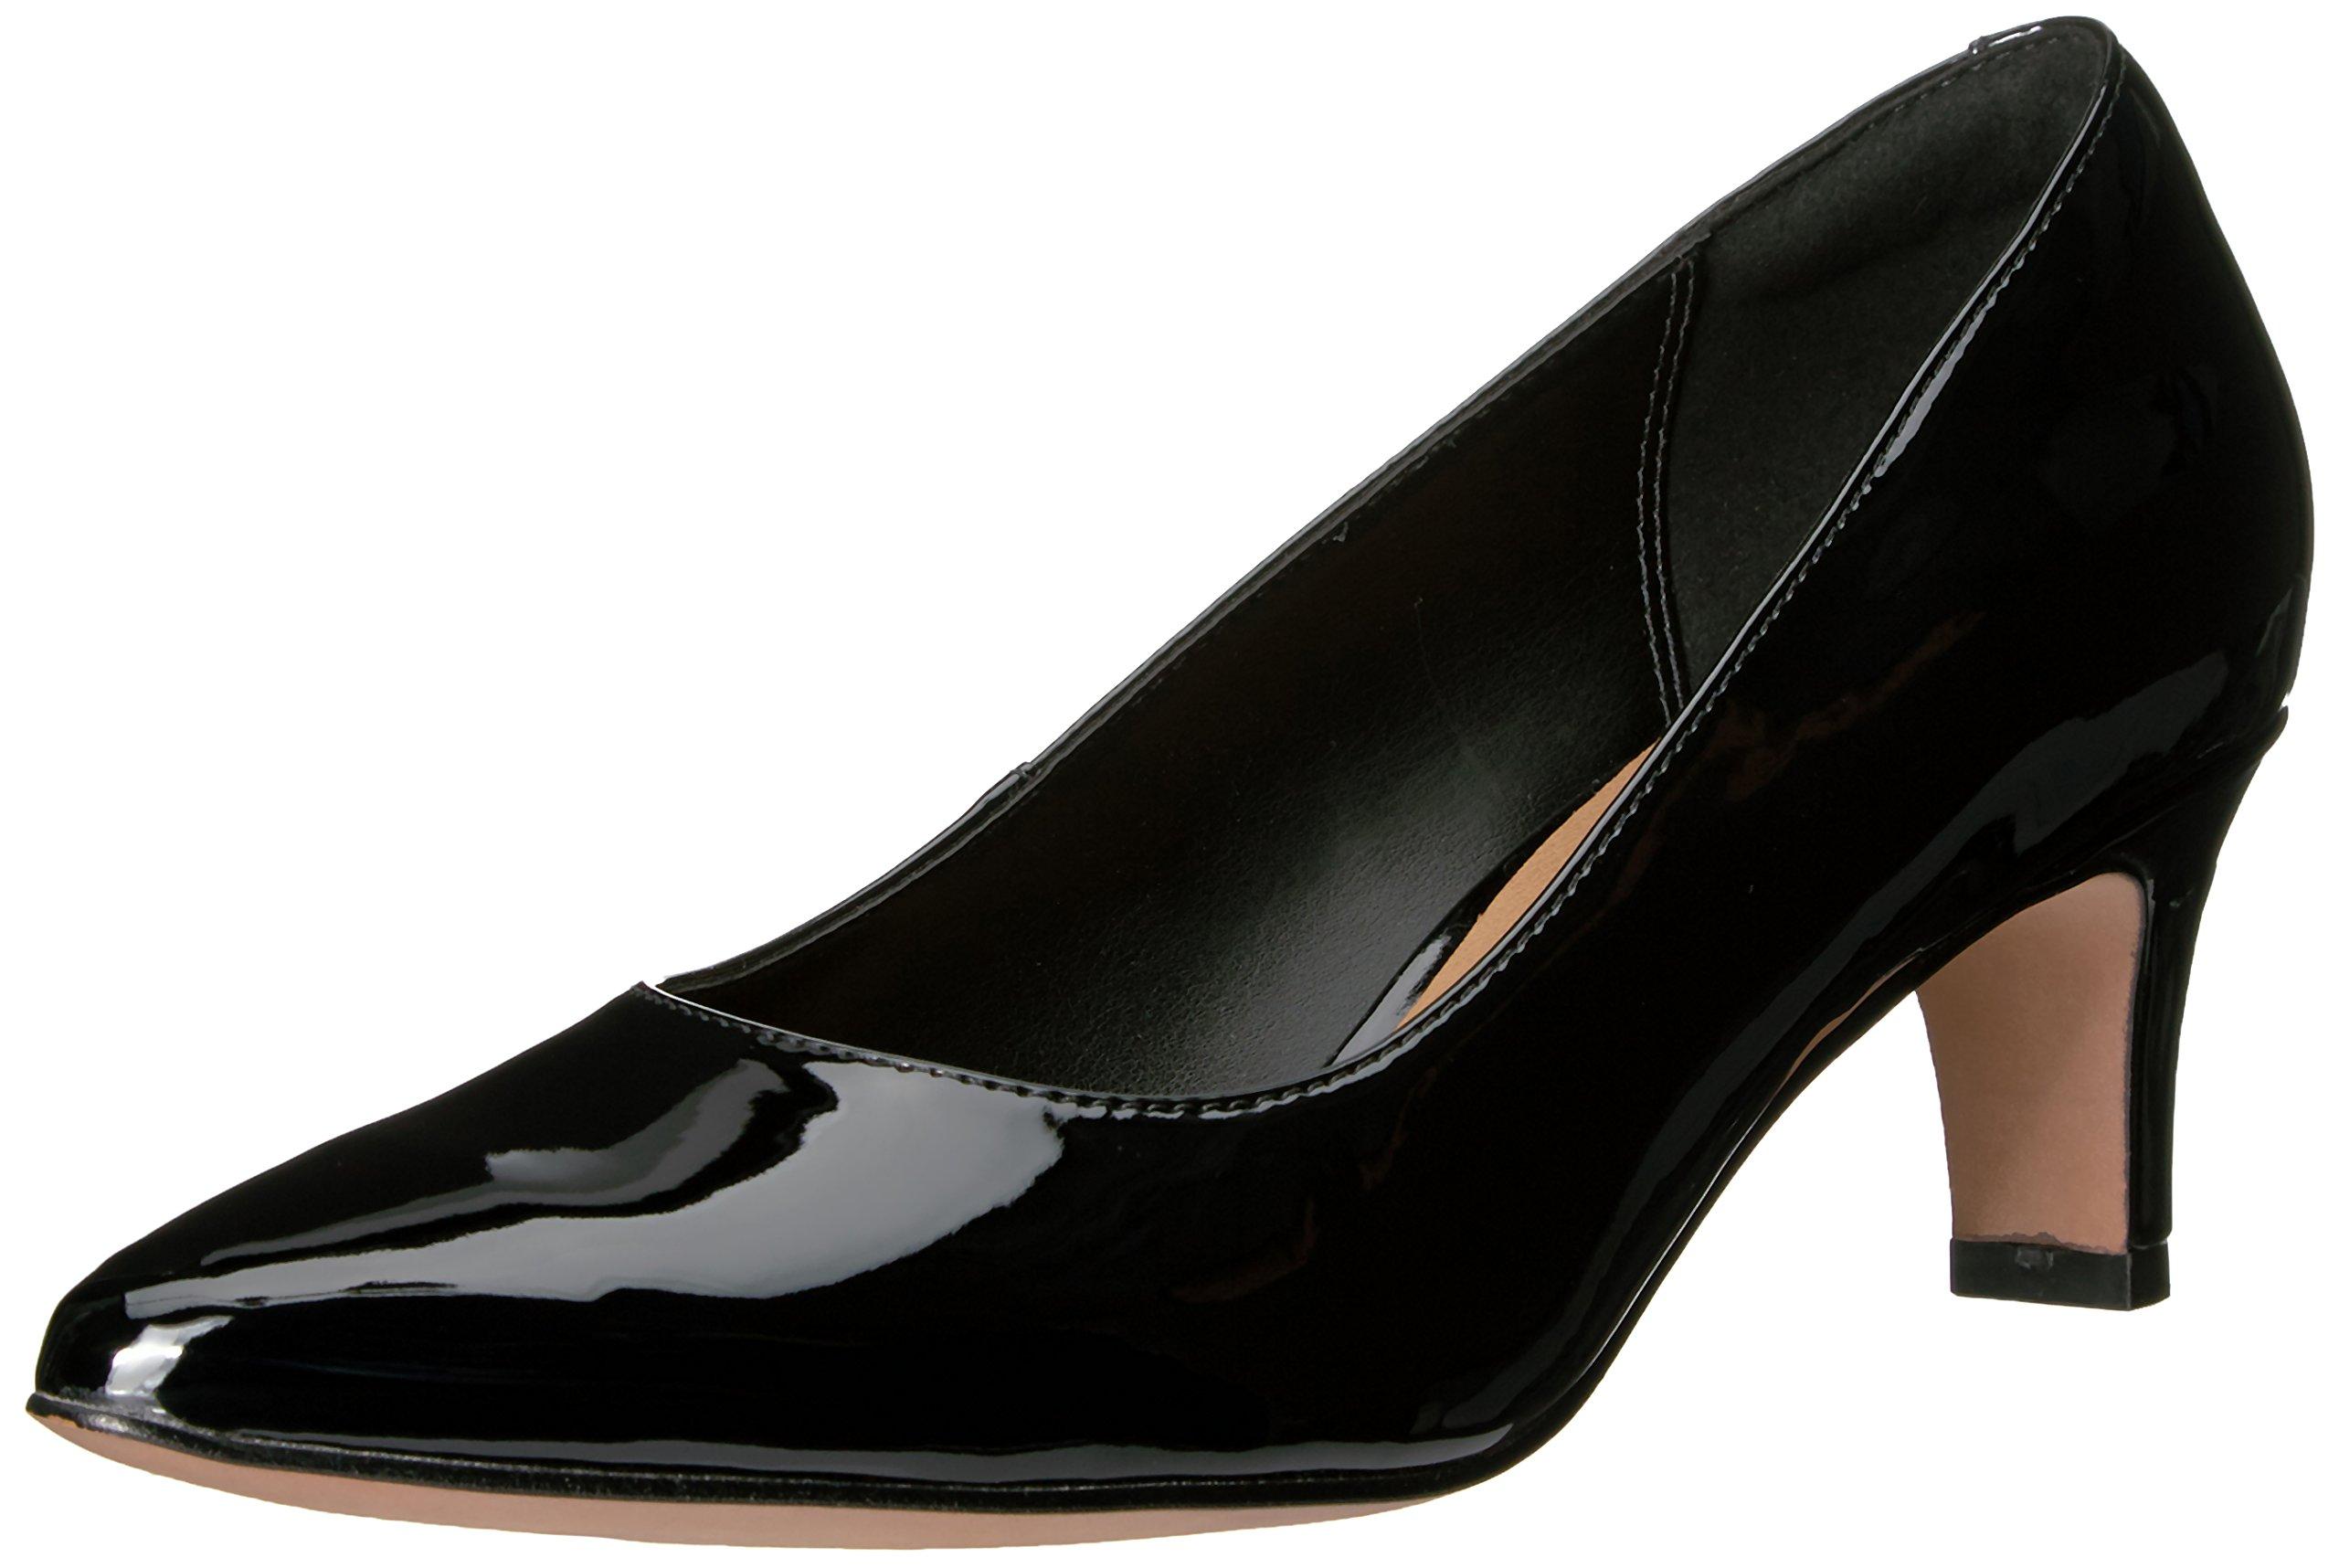 CLARKS Women's Crewso Wick Dress Pump, Black Patent Synthetic, 5.5 M US